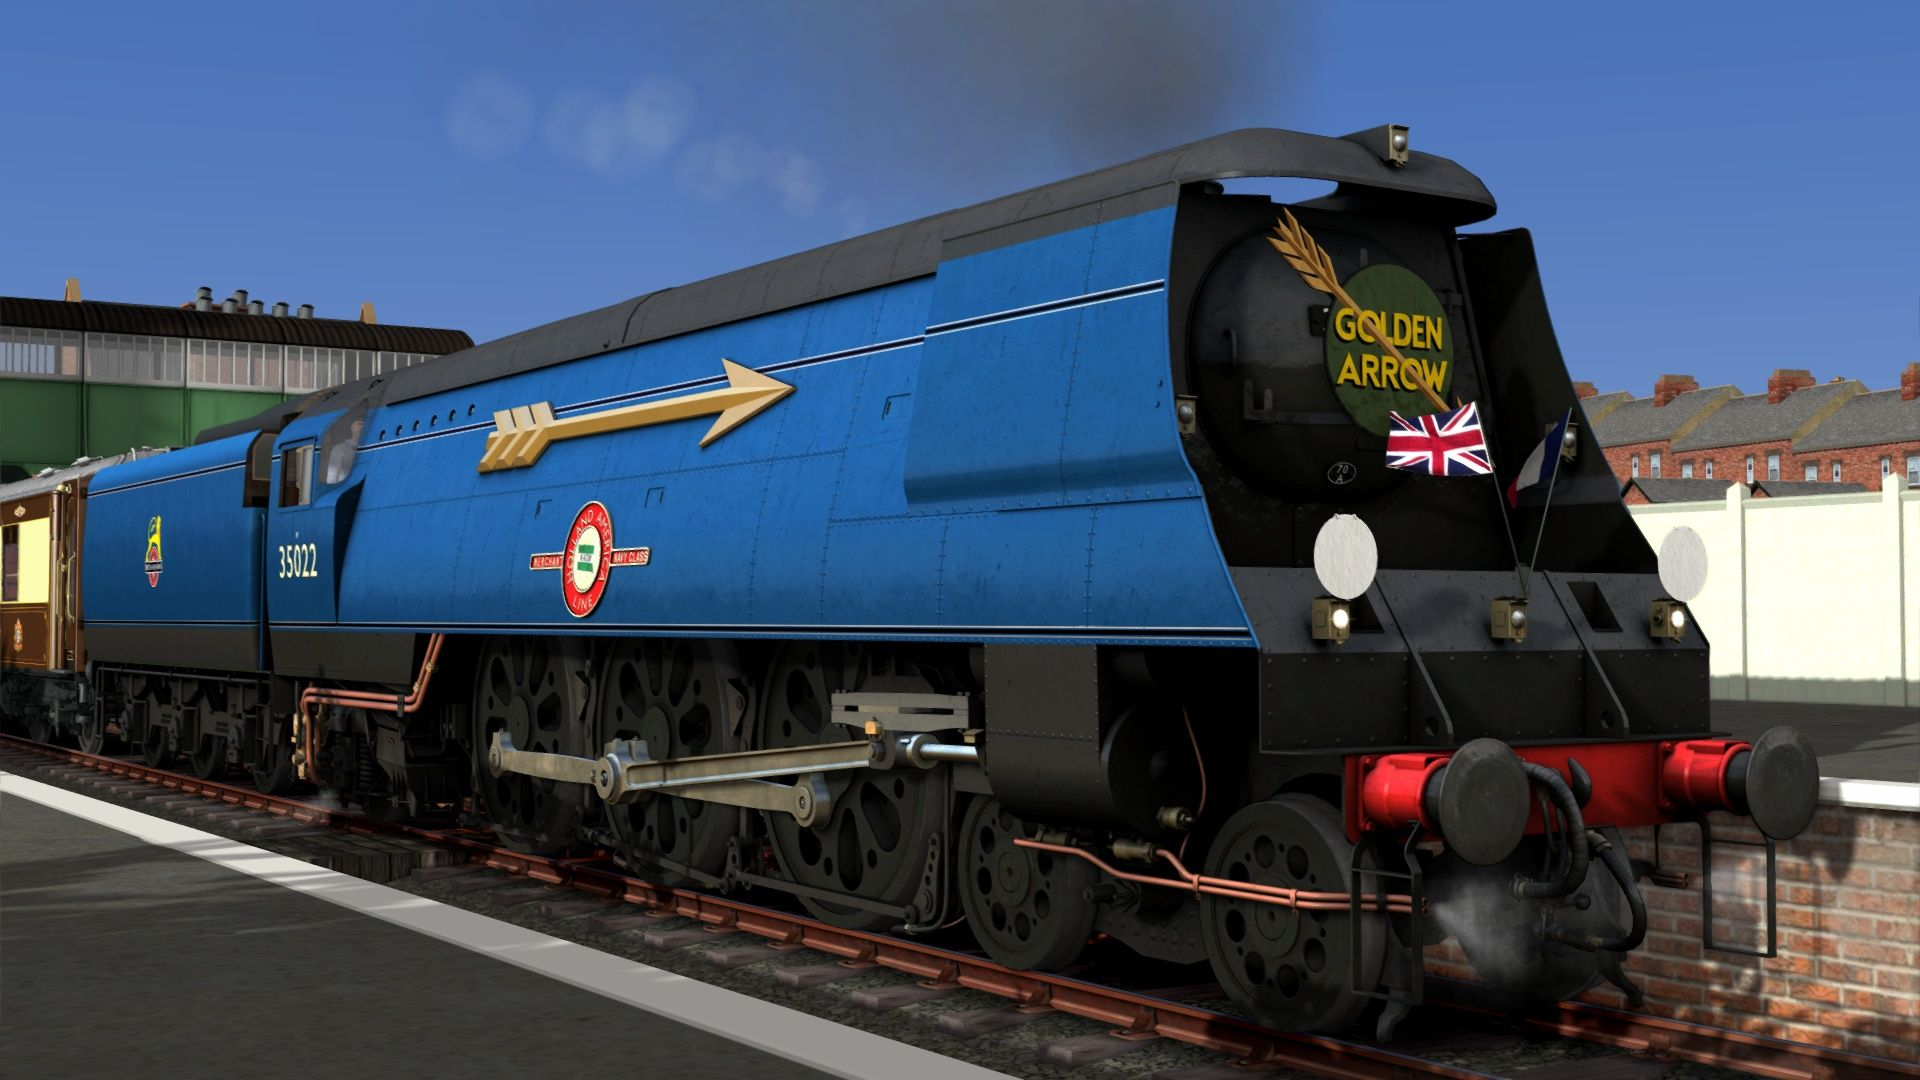 Screenshot_[PH] West of England Mainline_50.77881--3.00521_19-34-20.jpg